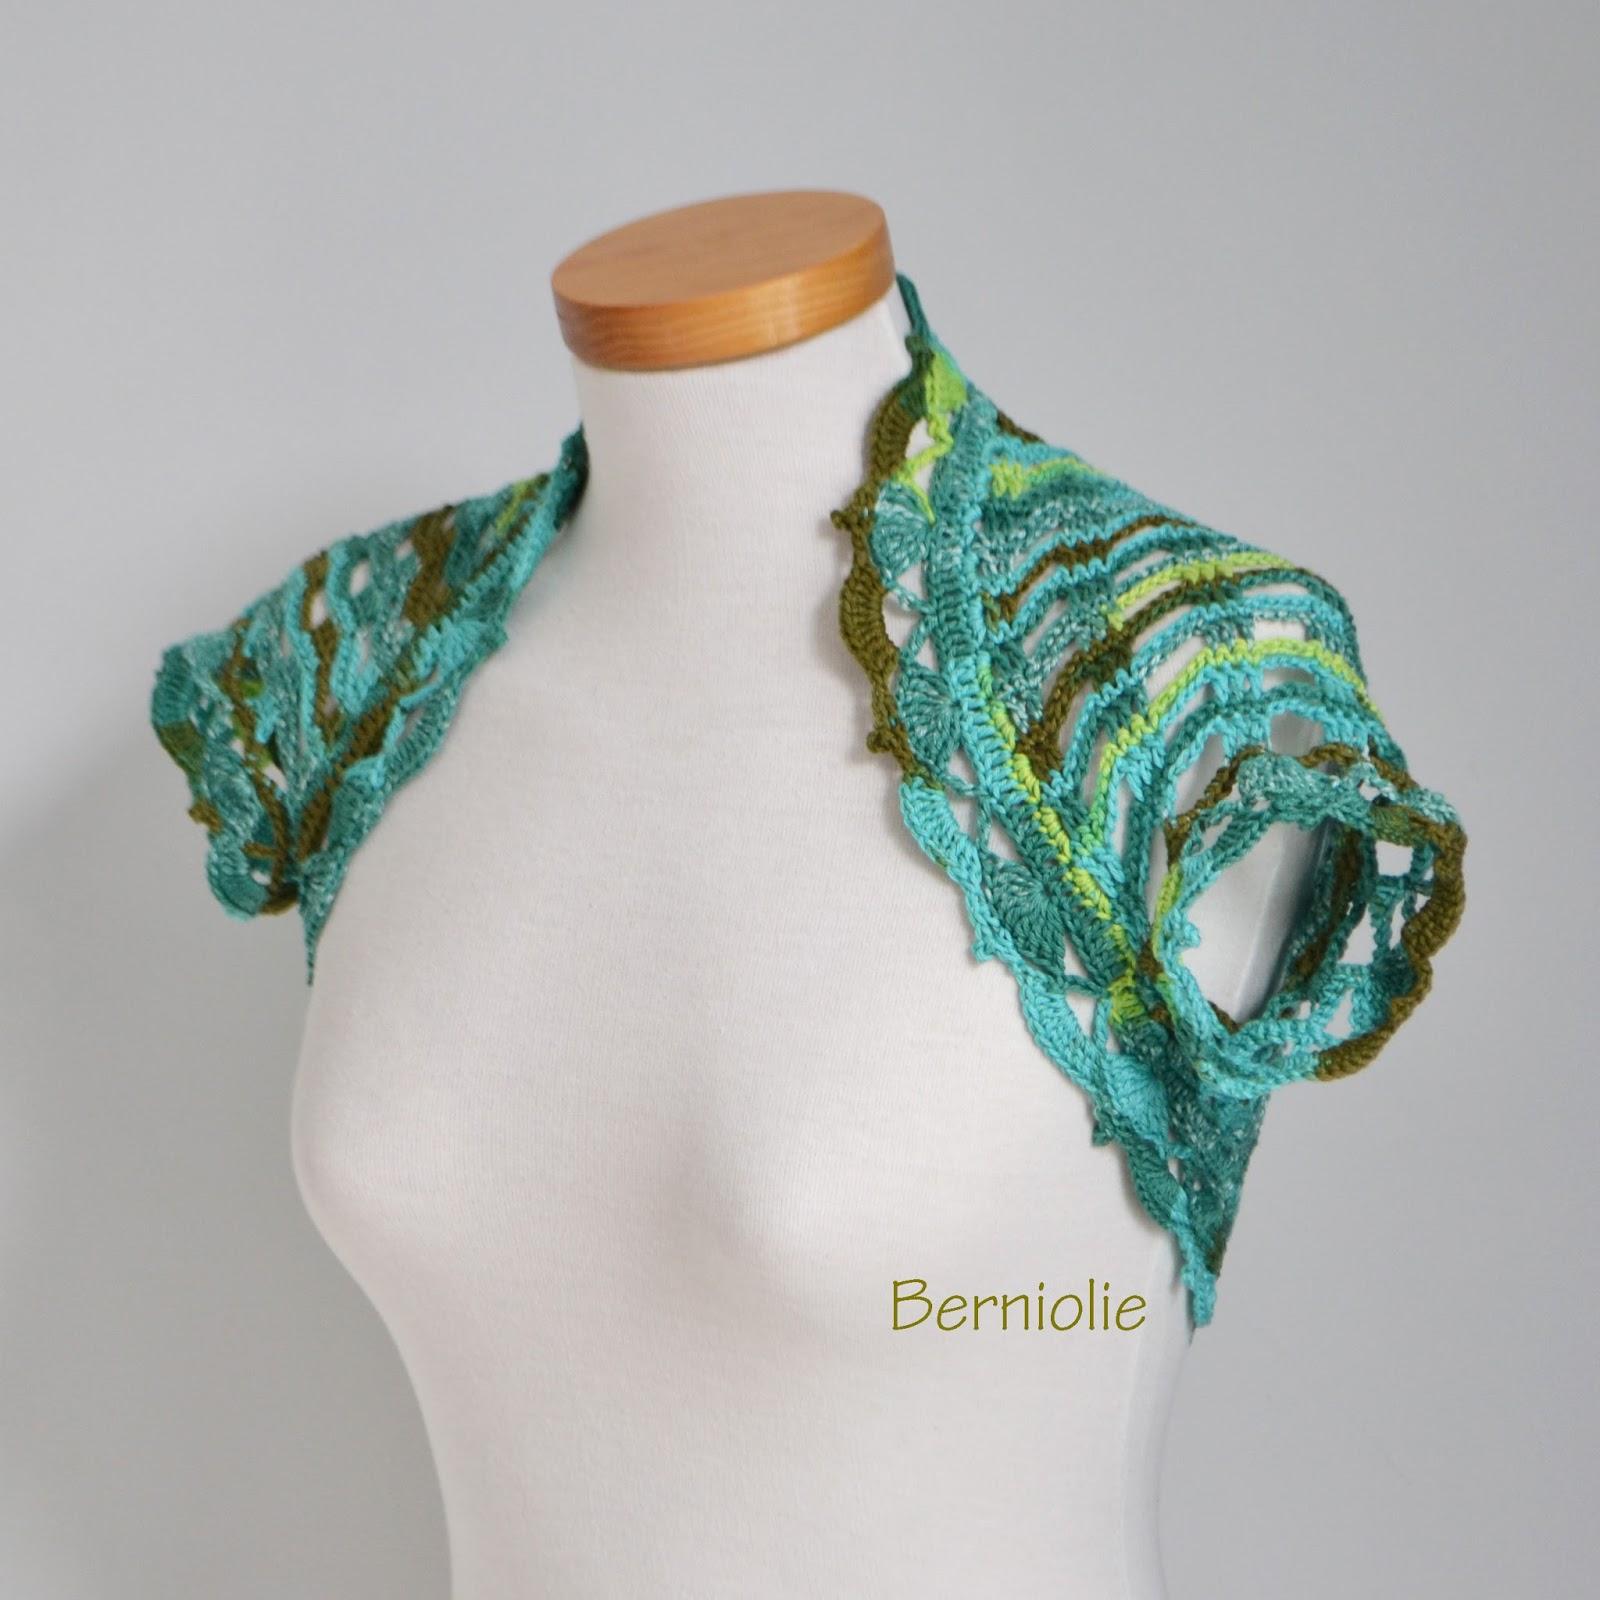 Berniolie Lace Crochet Shrugs